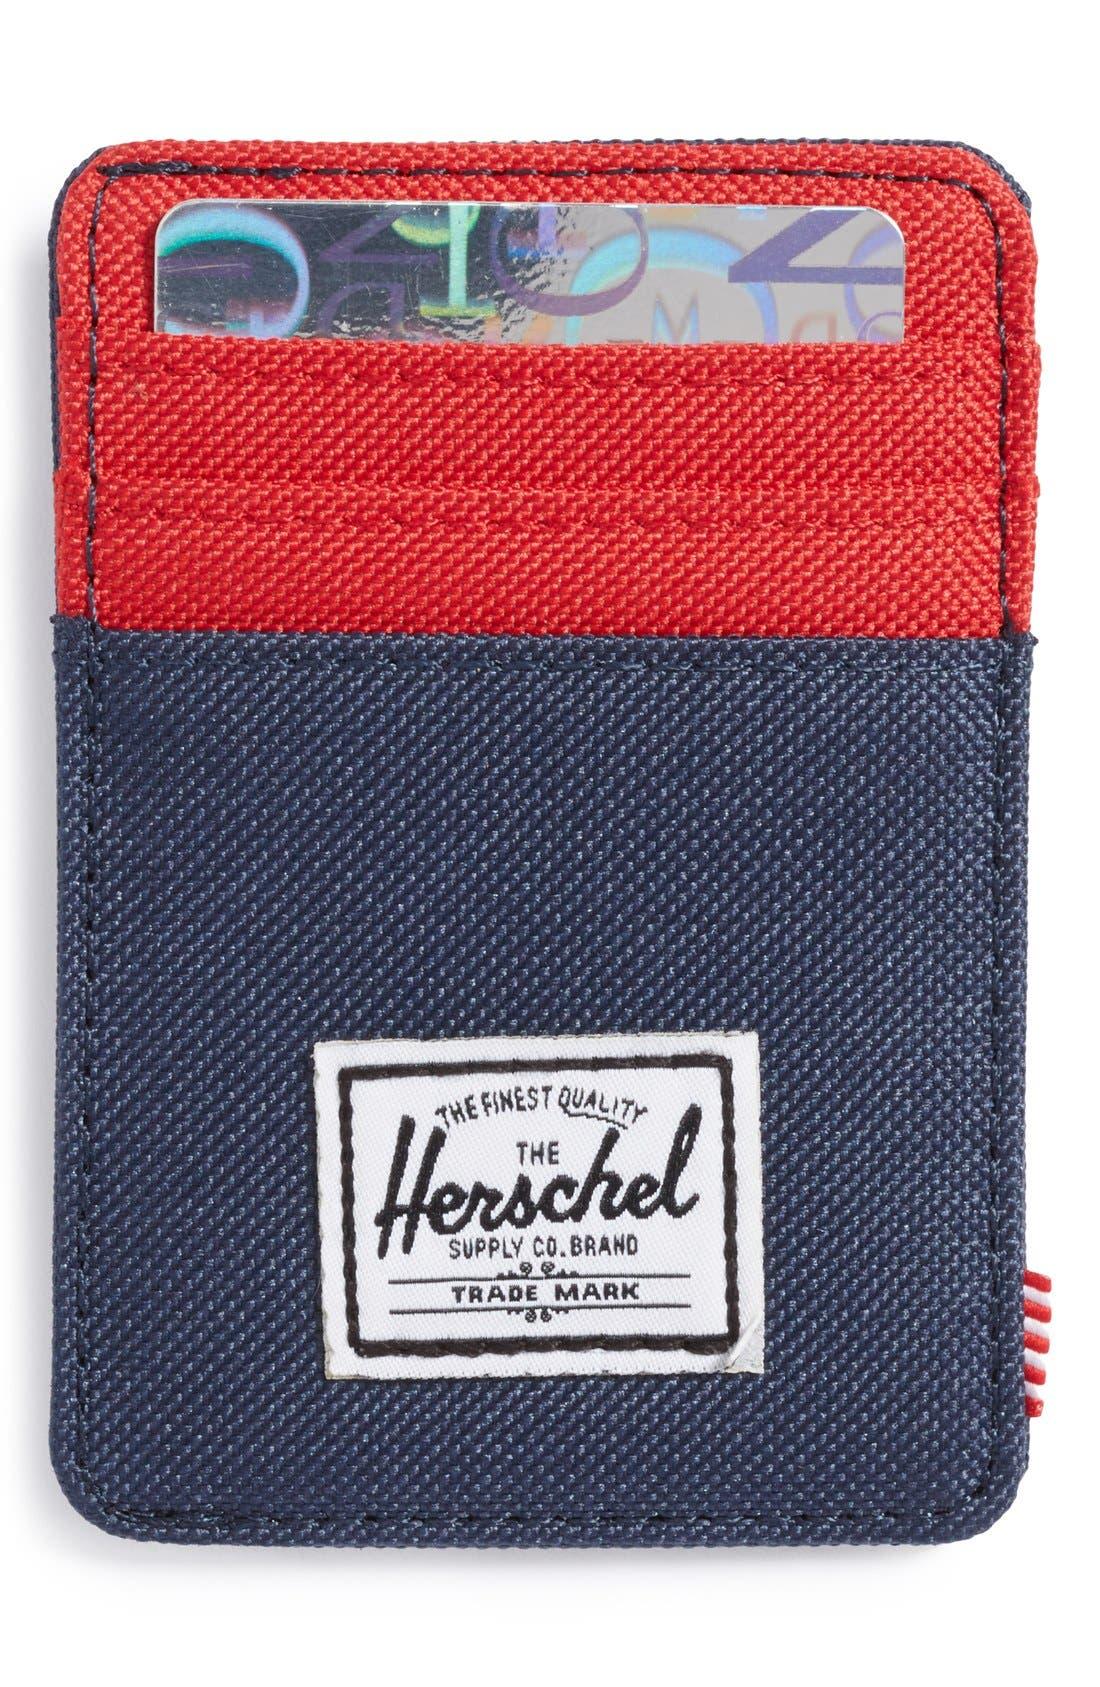 Alternate Image 1 Selected - Herschel Supply Co. 'Raven' Card Case